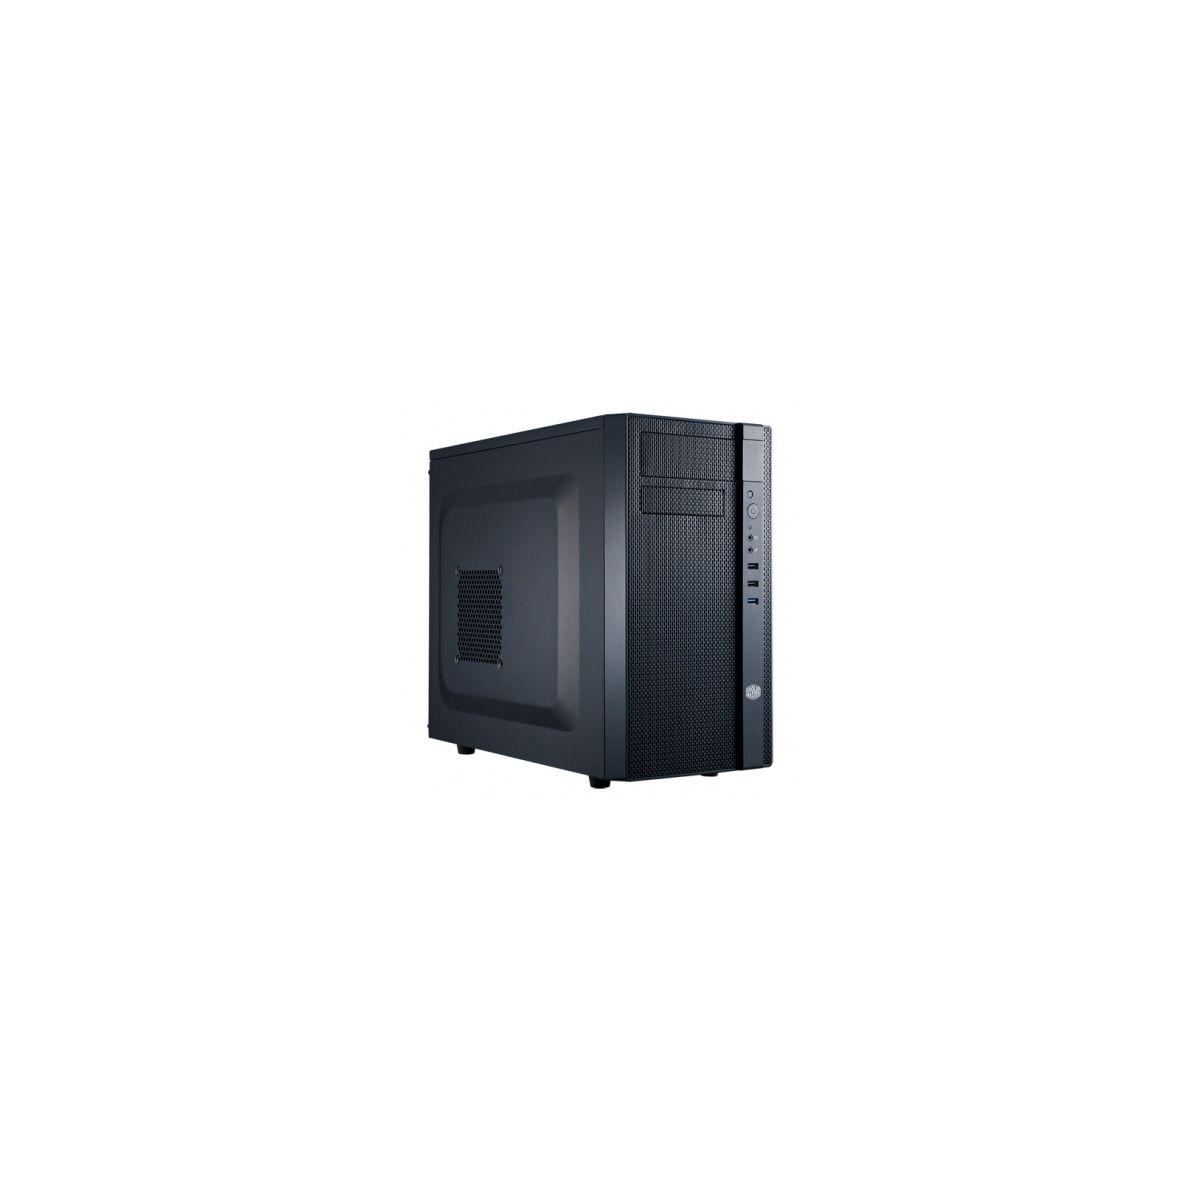 Boîtier cooler master n200 tour midi - mini itx / micro atx - 3% de remise immédiate avec le code : multi3 (photo)